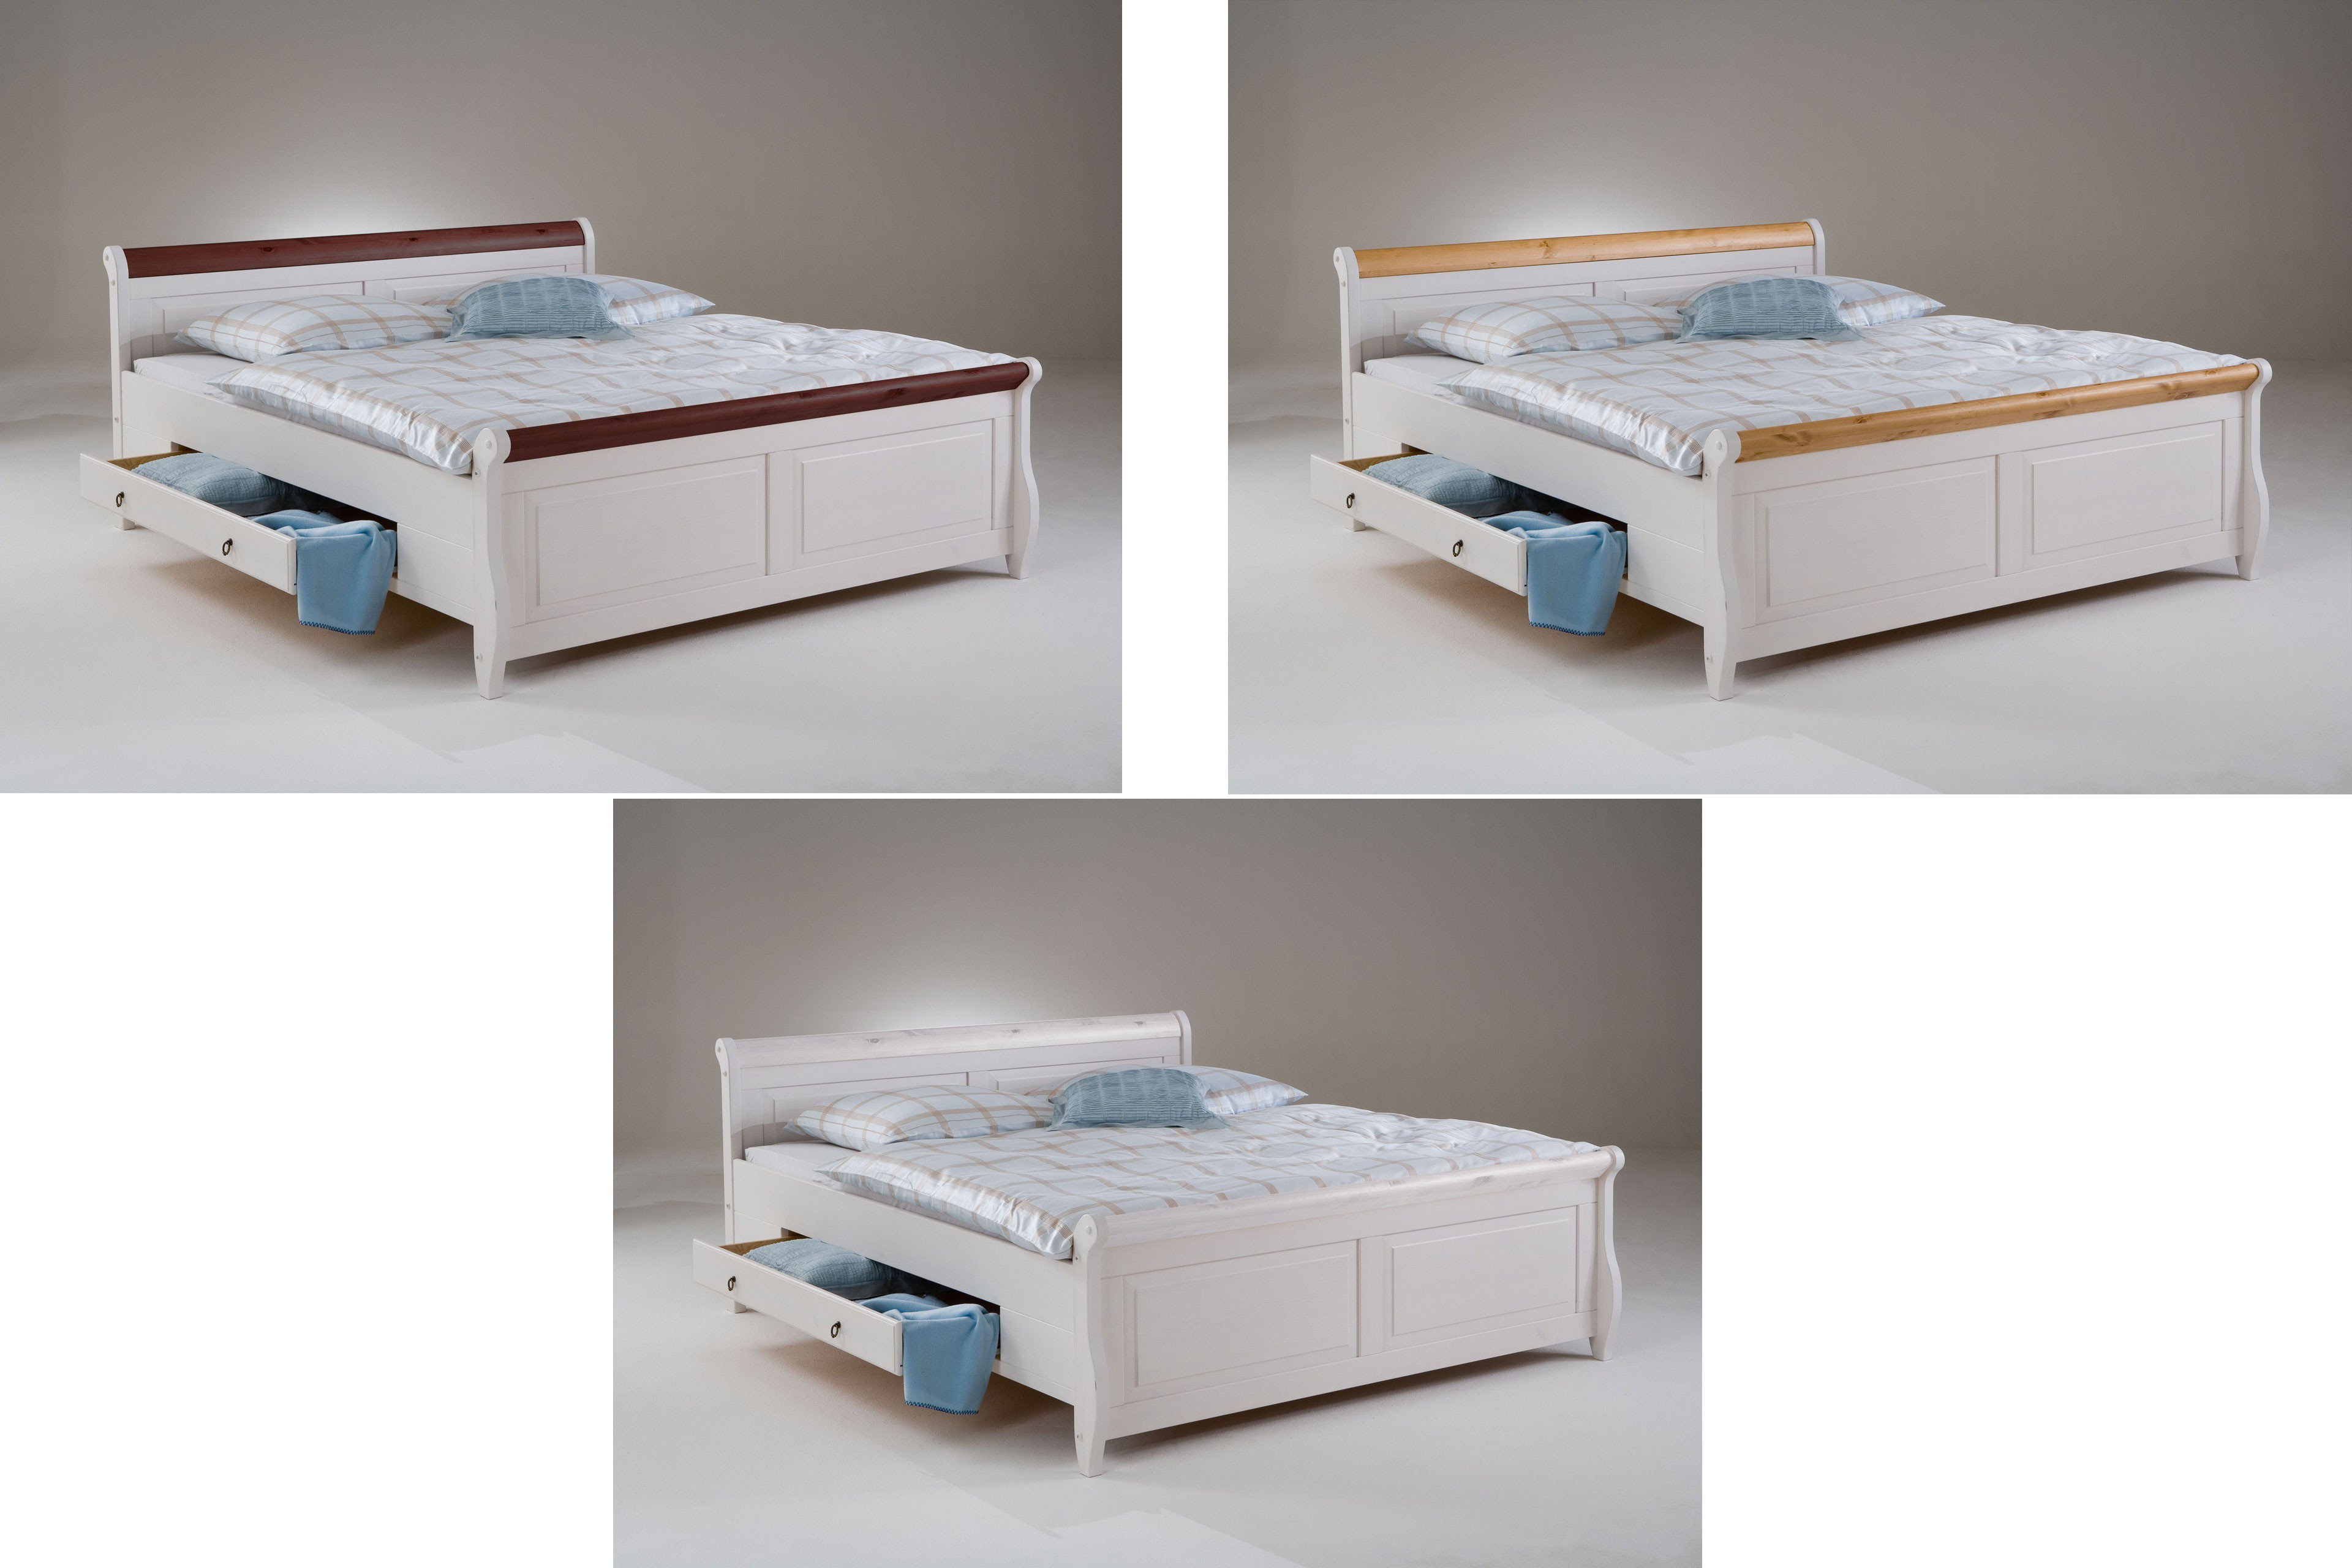 euro diffusion schlafzimmer helsinki kiefer m bel letz ihr online shop. Black Bedroom Furniture Sets. Home Design Ideas